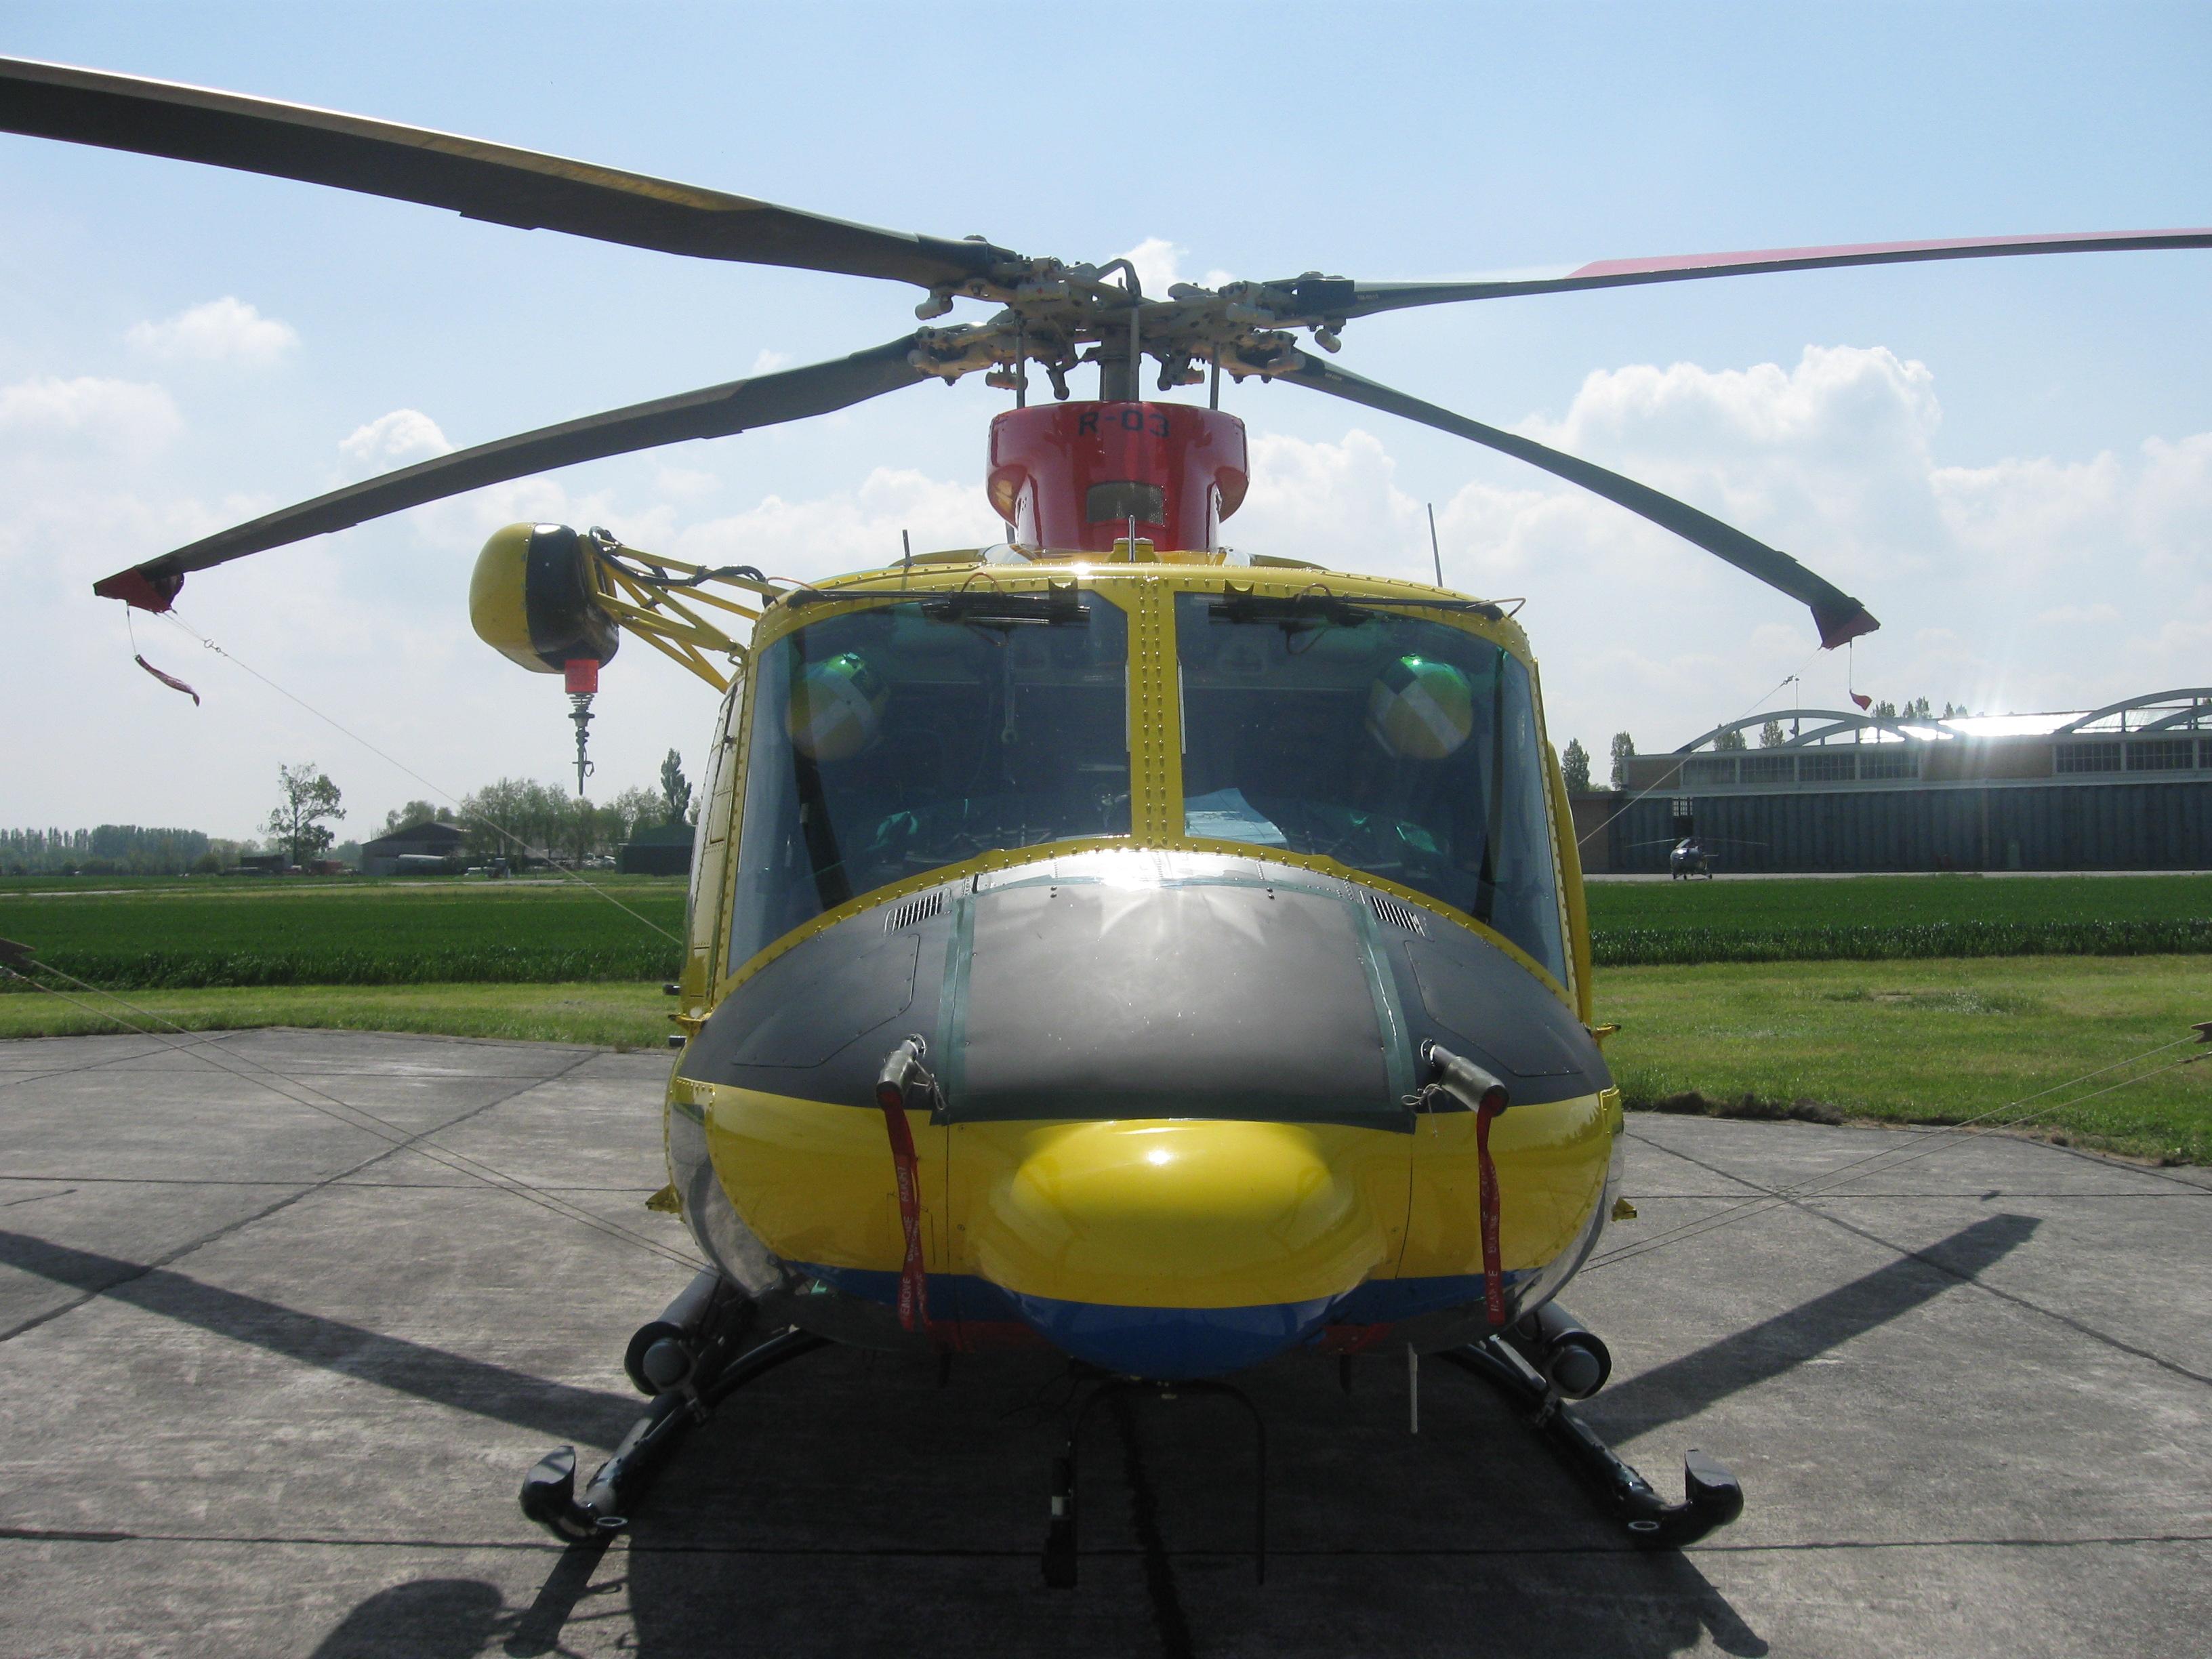 Helico's : divers, photos, infos 1005180812011050246058951